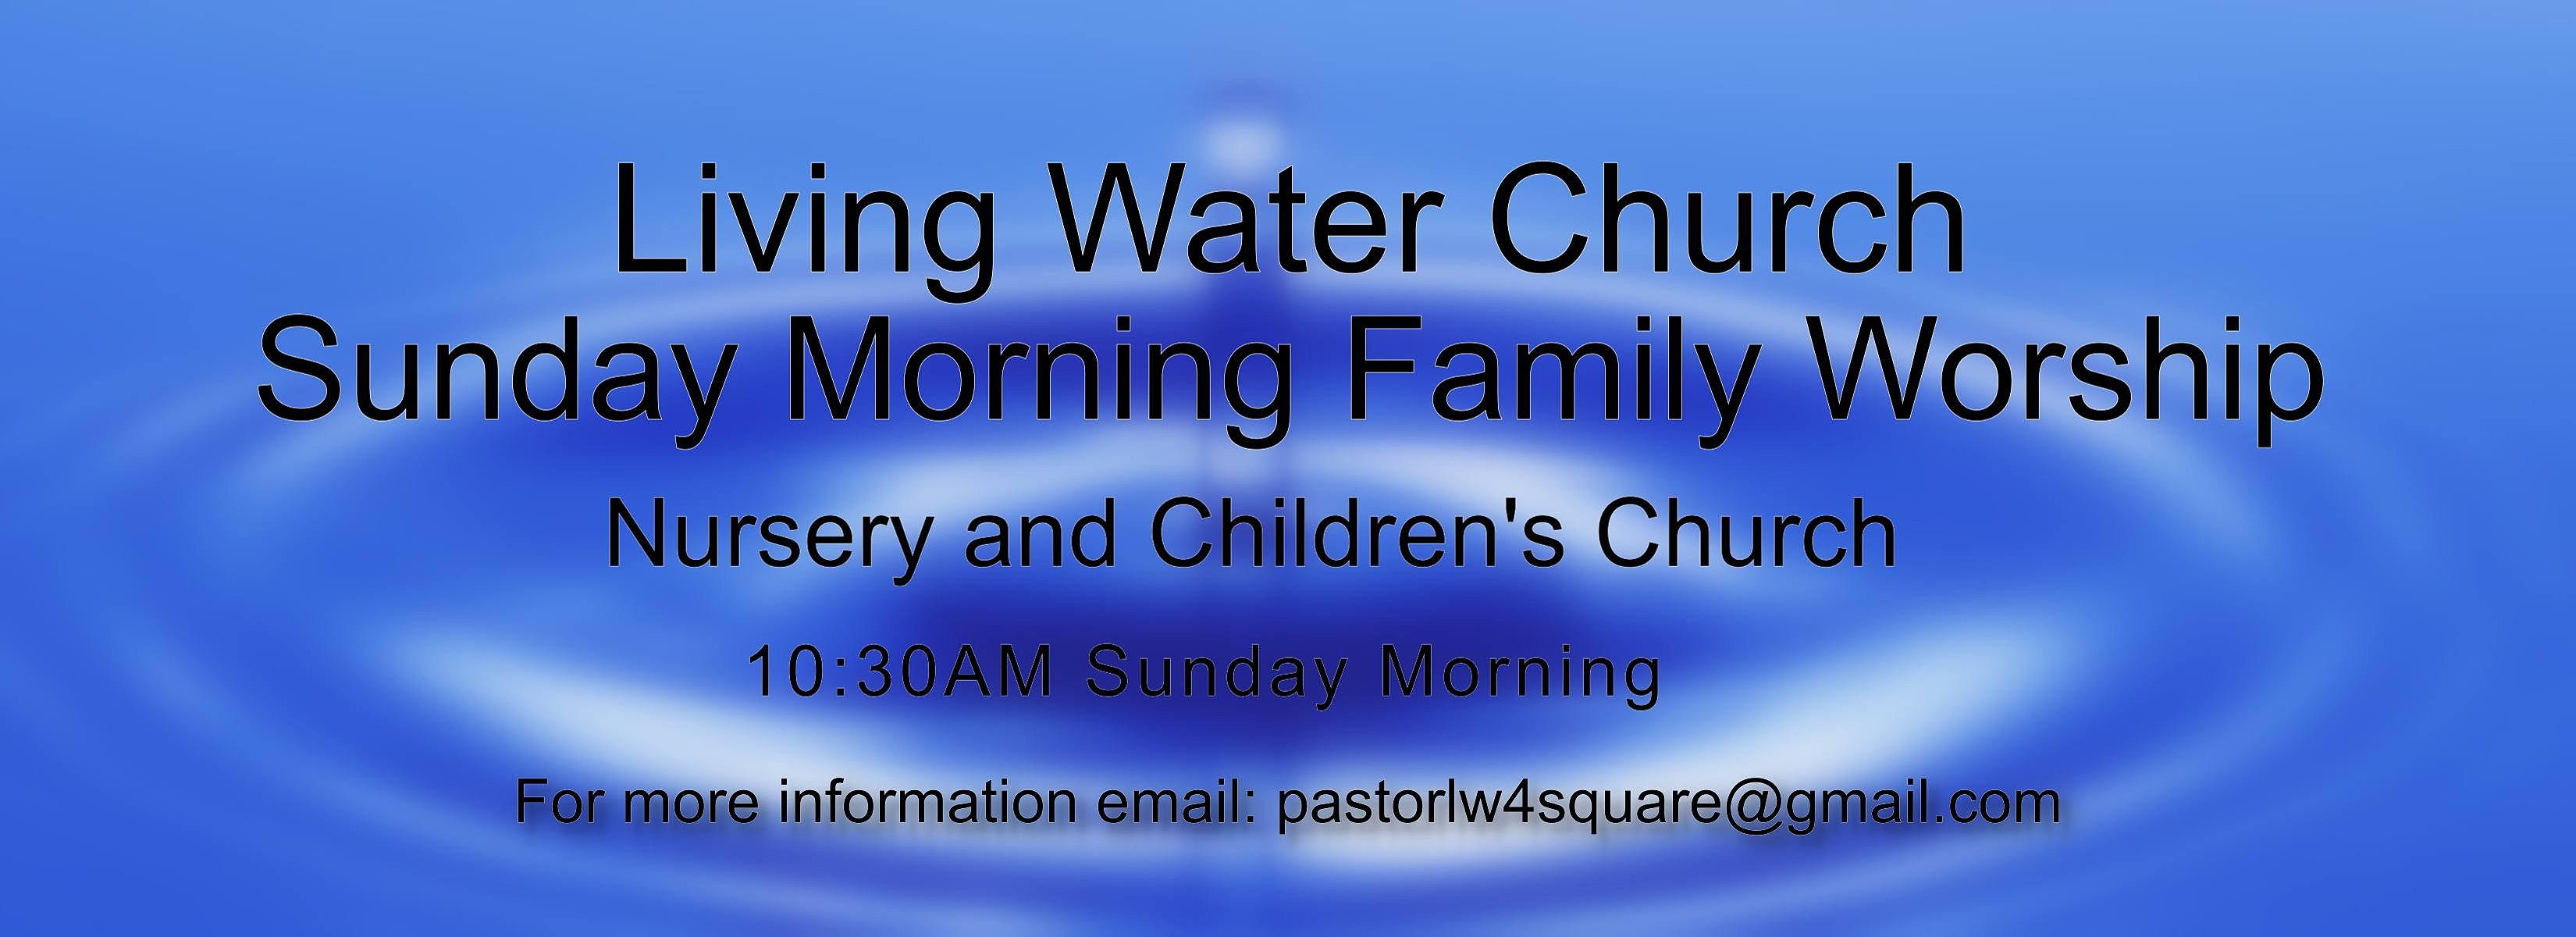 Nice Living Water Church #1: 14d77e_034b034d05764a8cba7ca10a70cc64e3.jpg_srz_3300_1200_85_22_0.50_1.20_0.00_jpg_srz